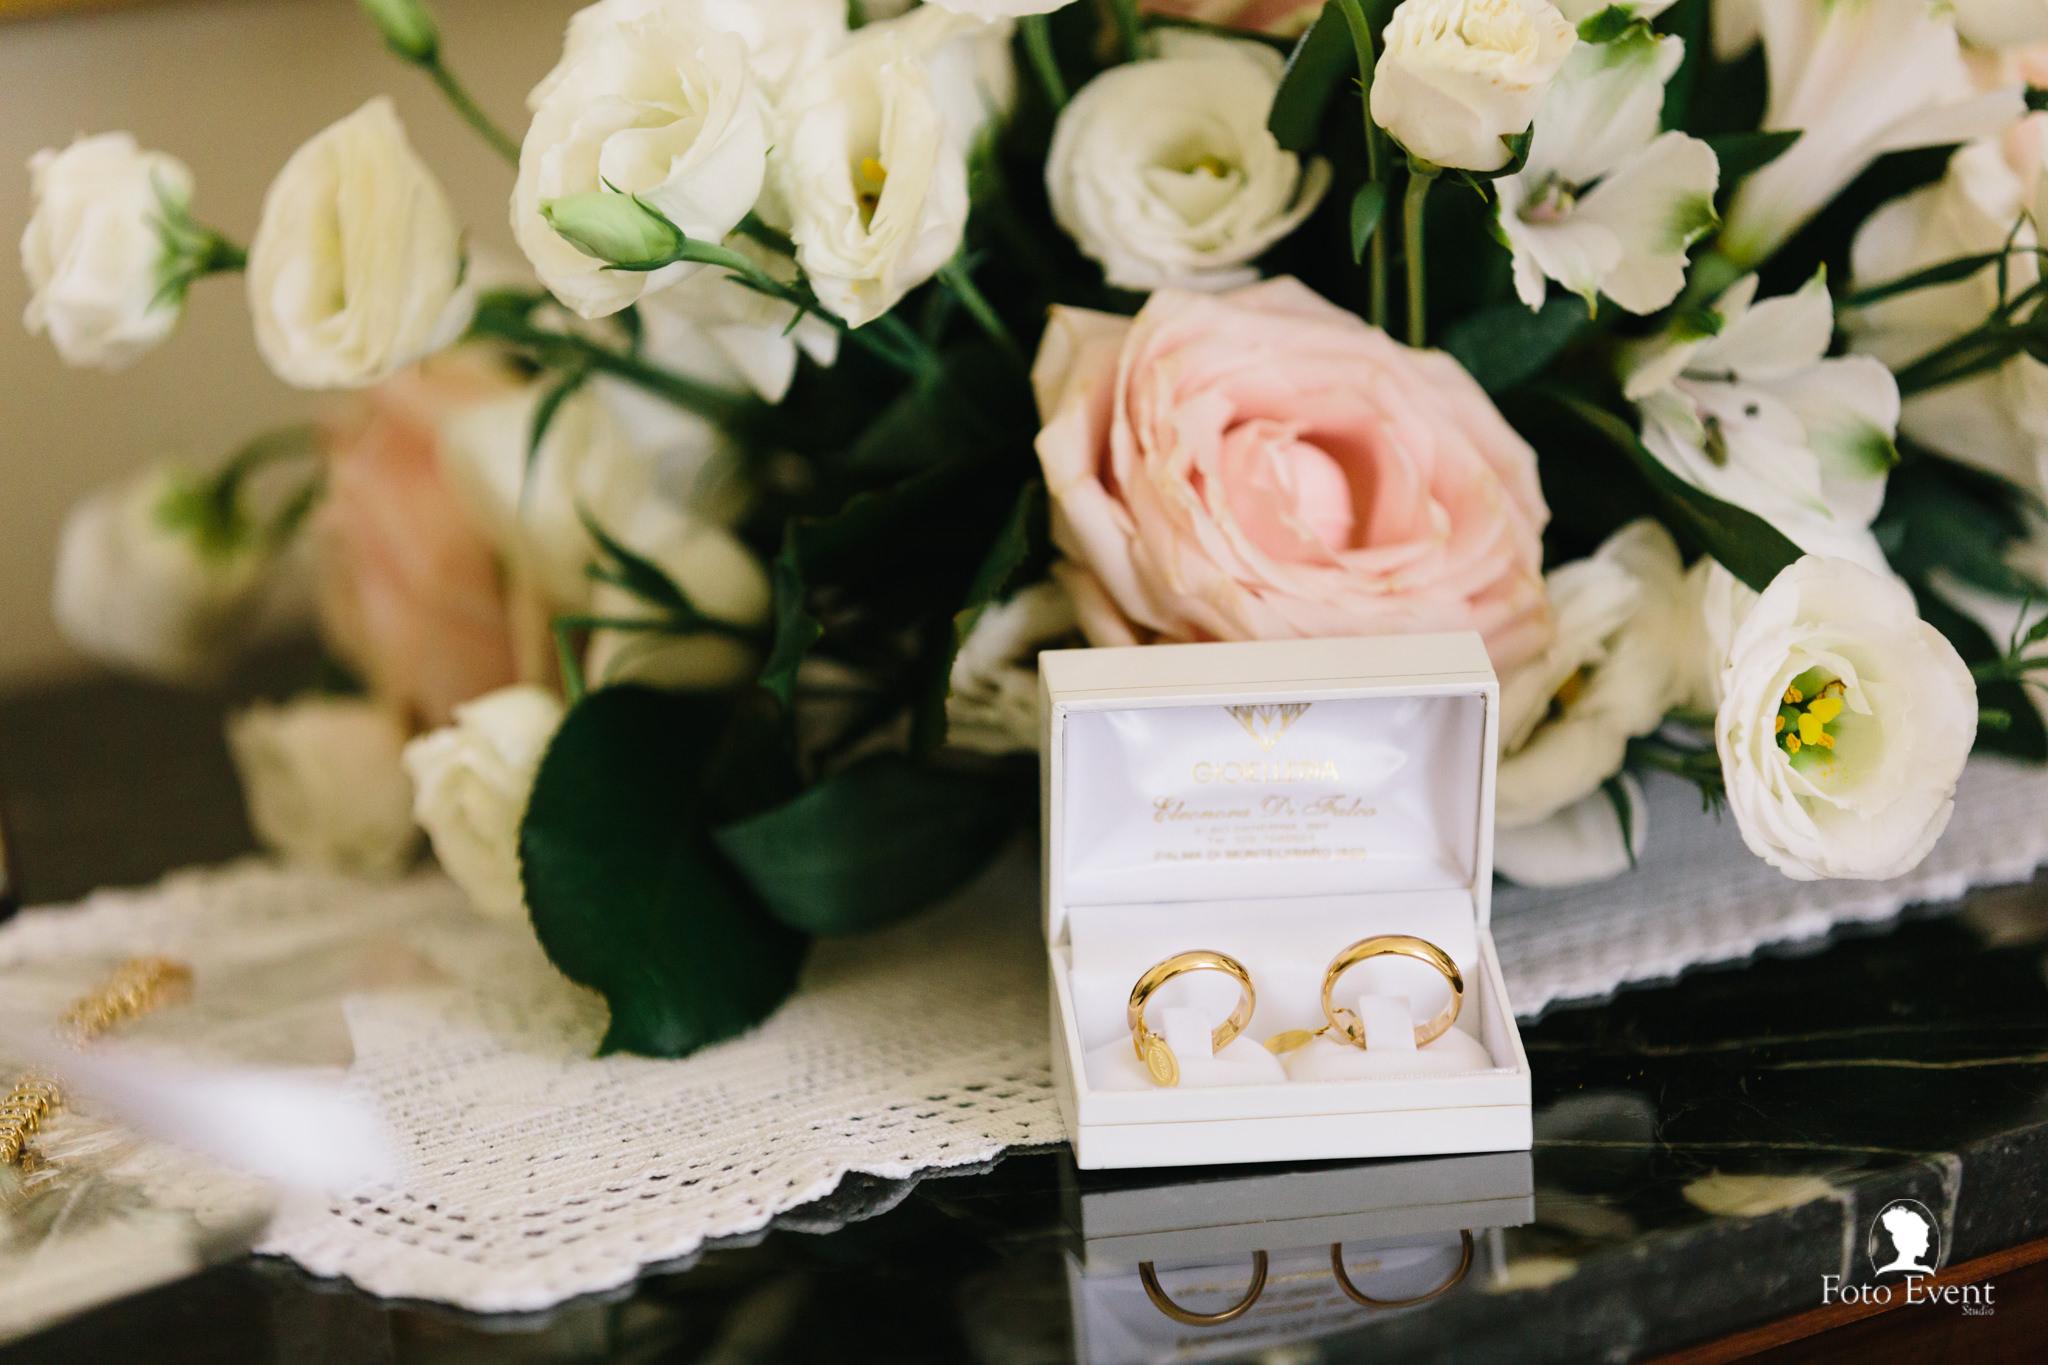 008-2019-09-09-Matrimonio-Dorotea-e-Alberto-Iemmolo-zoom-016